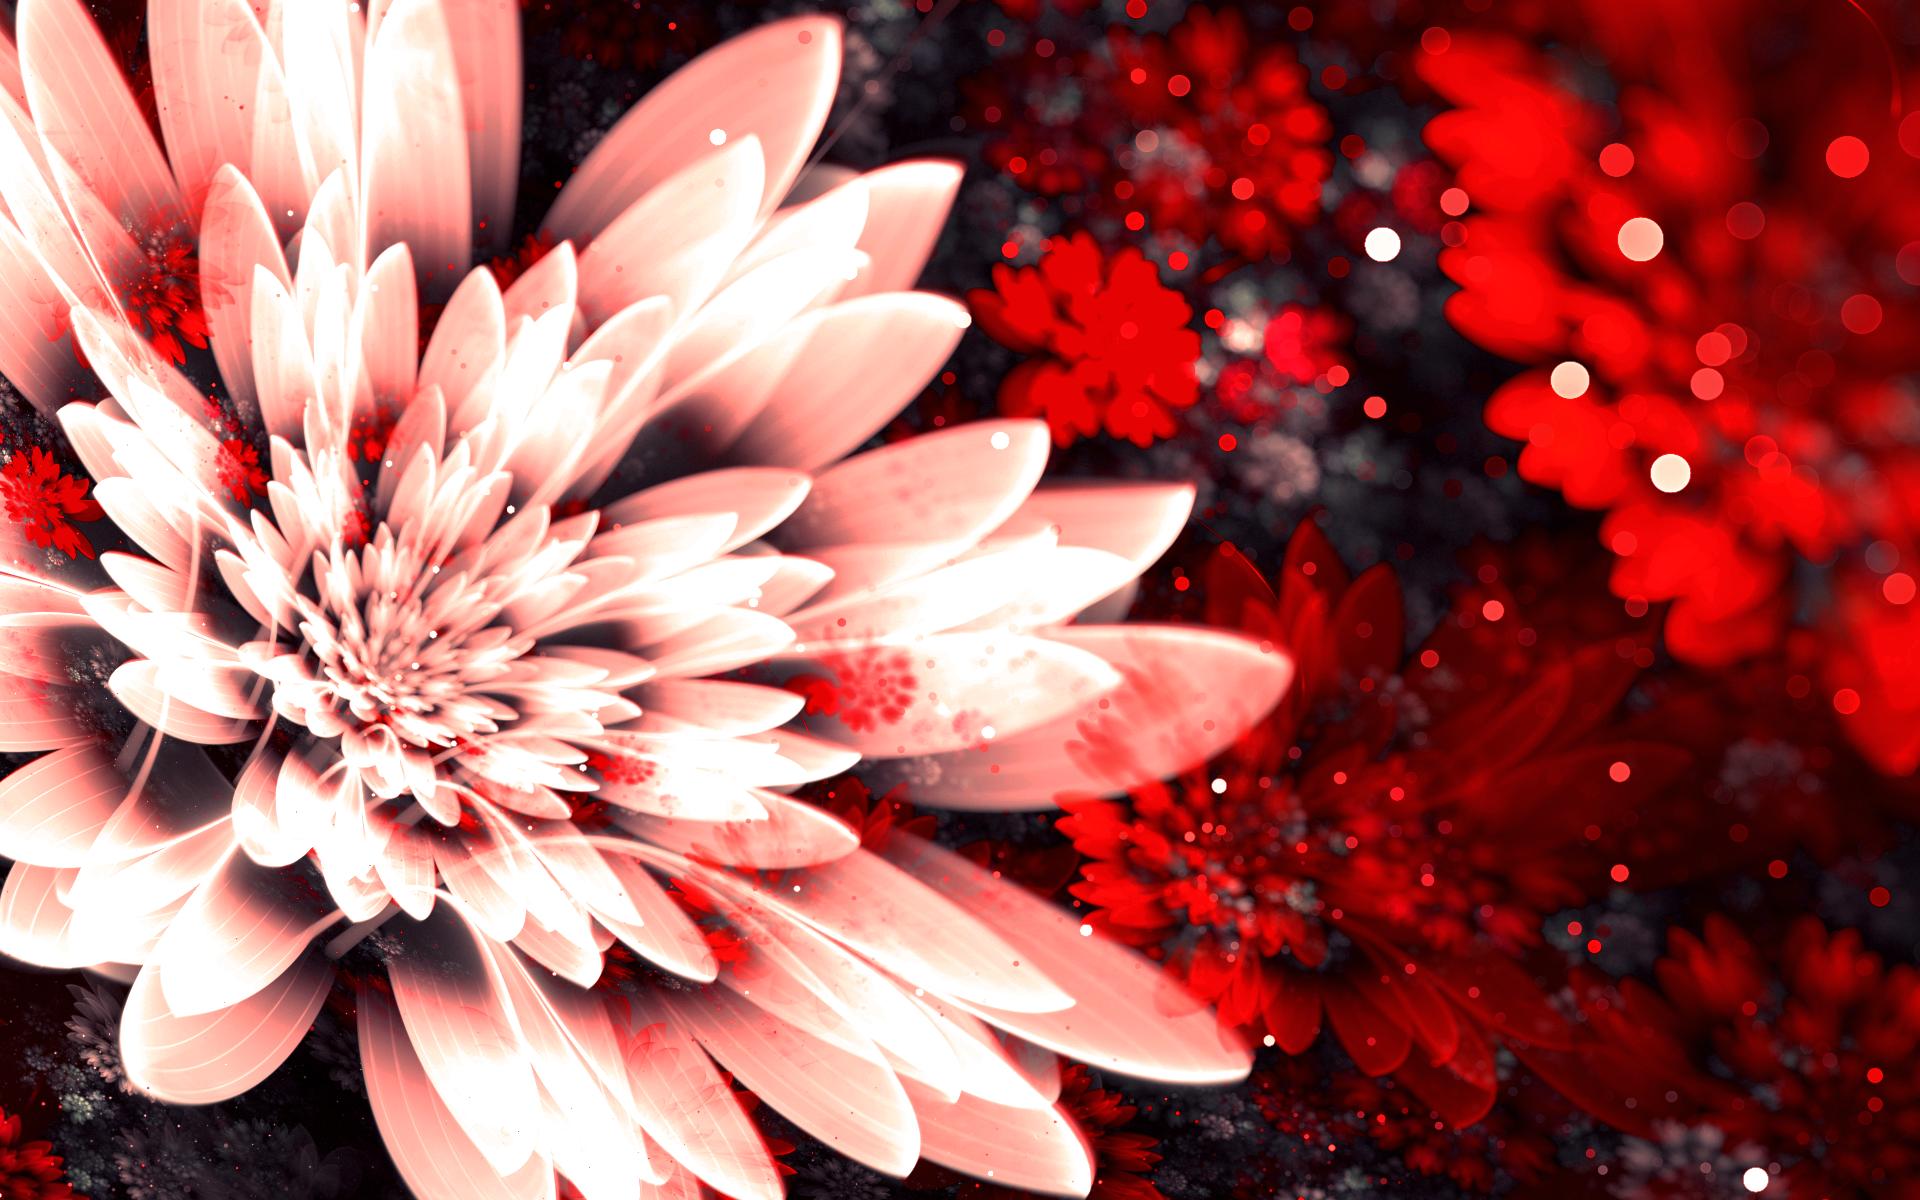 Geisha by Esherymack